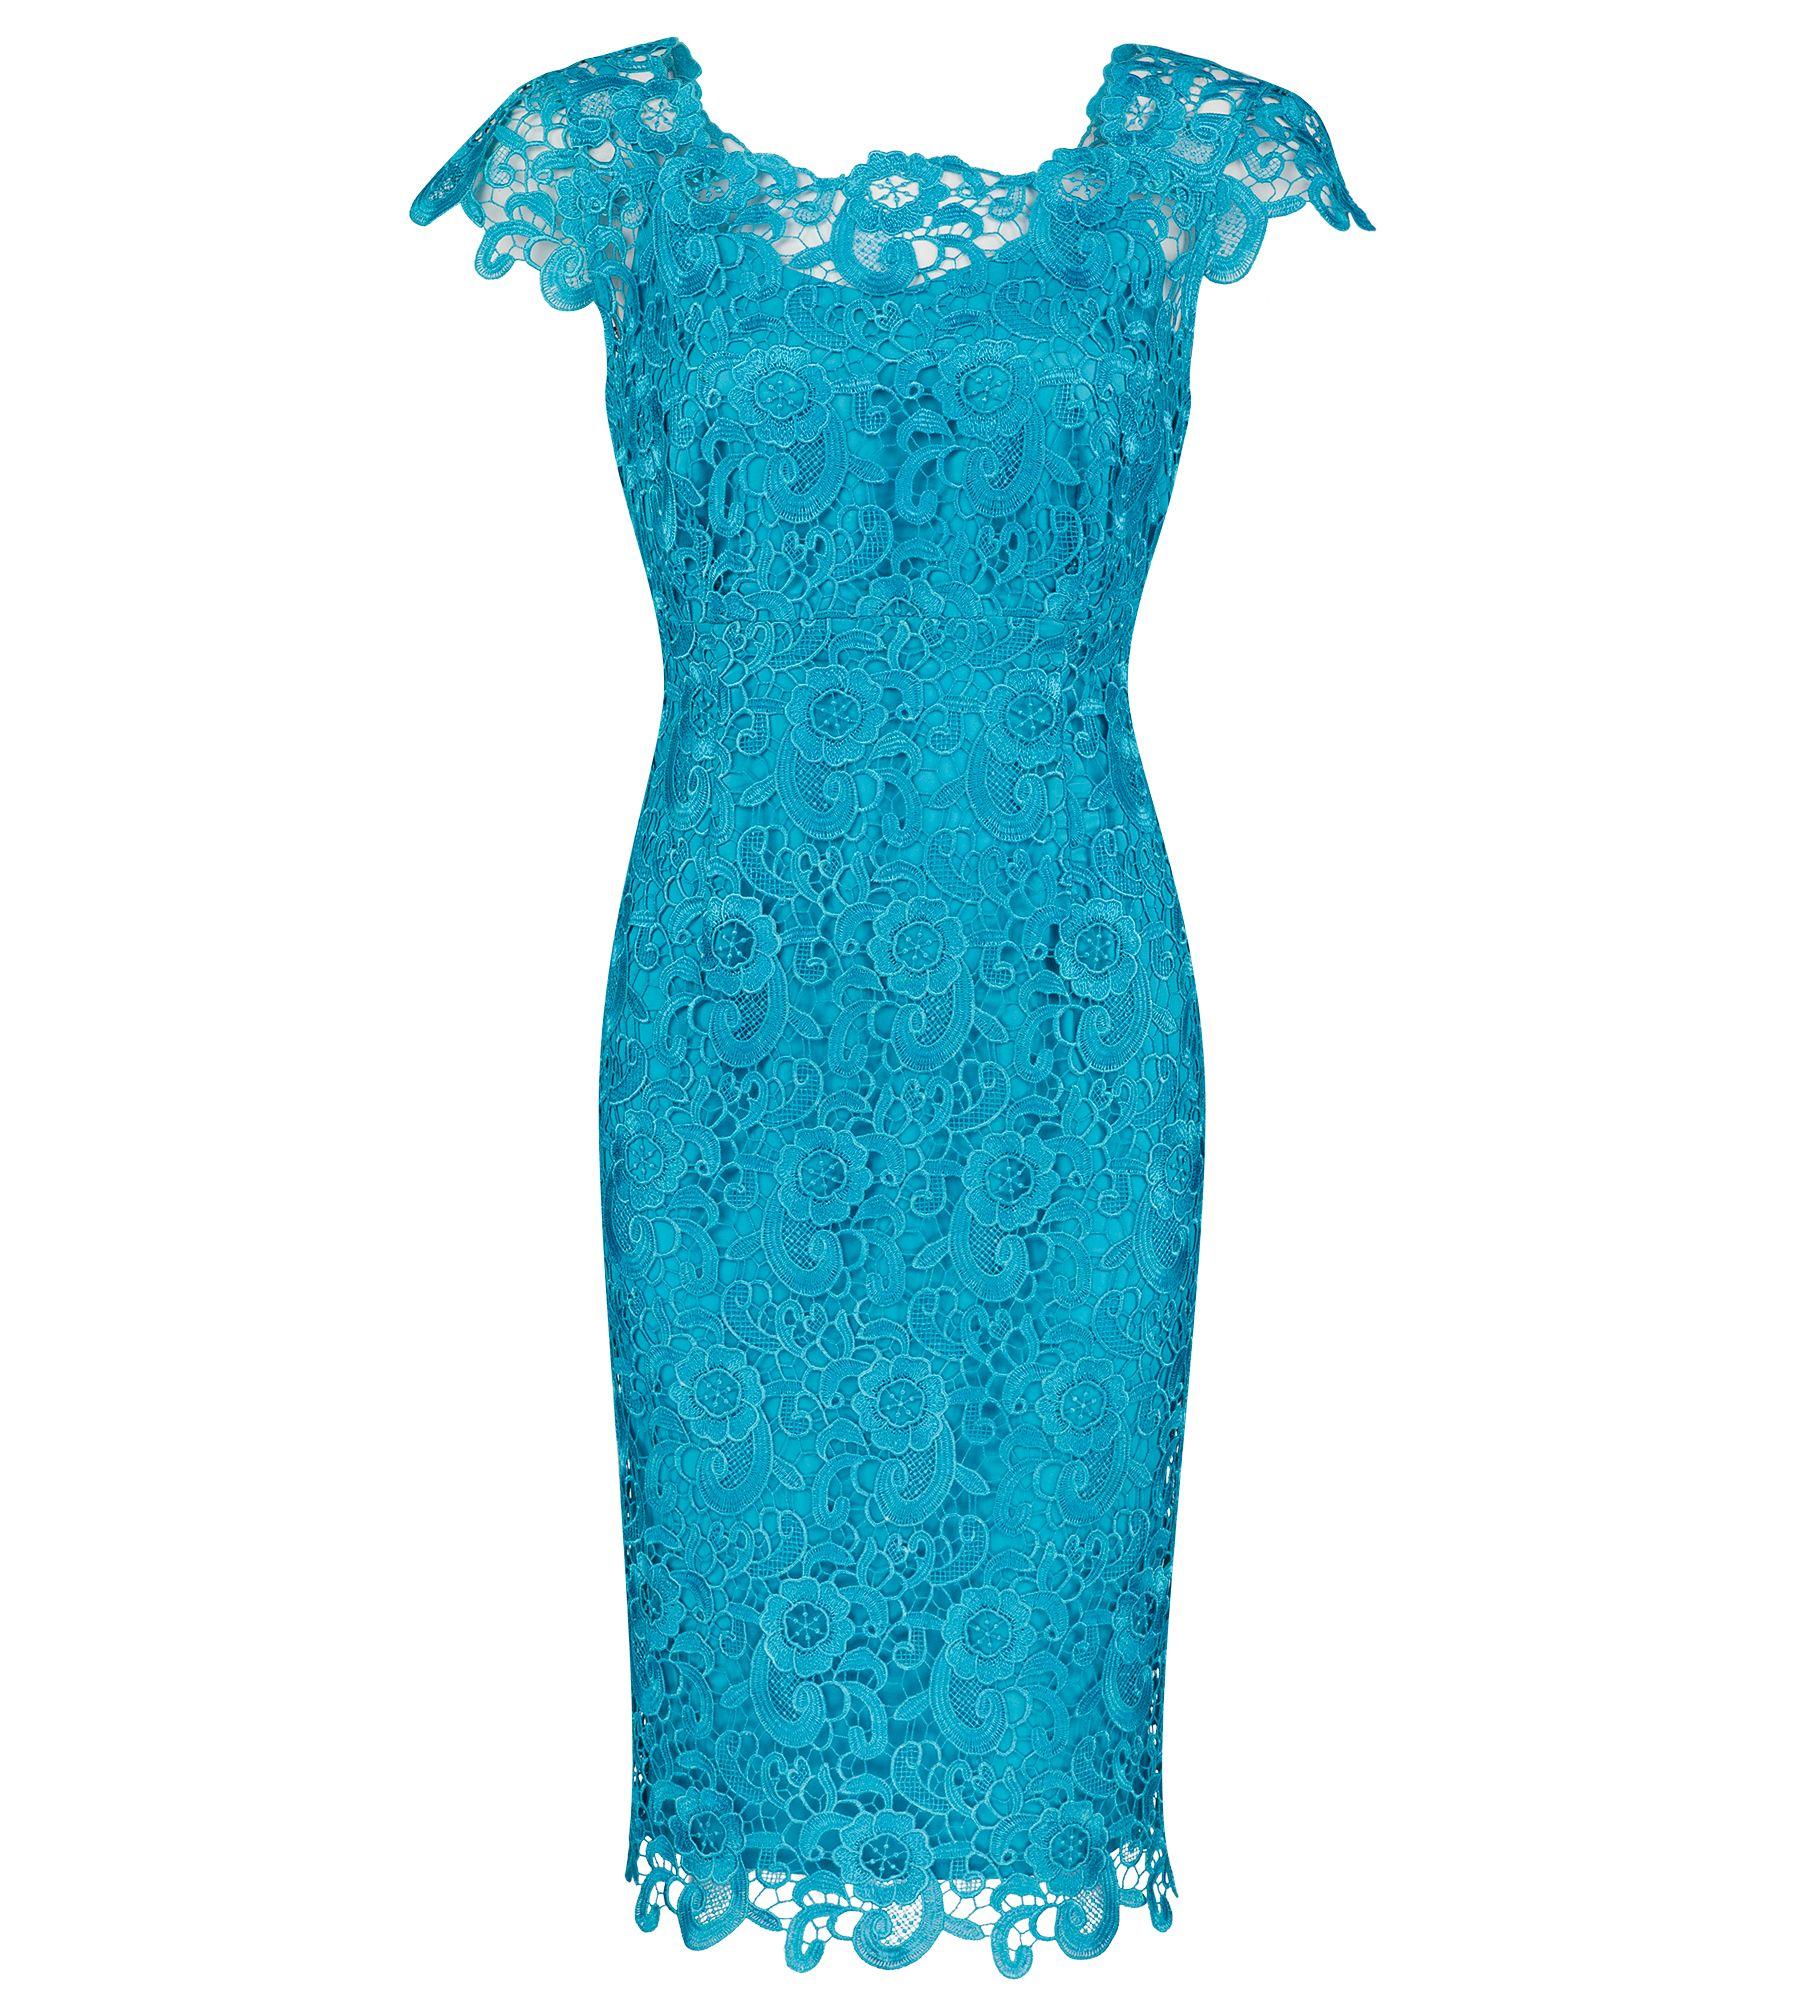 Dresses : Lagoon Guipure Lace Dress | Wedding Stuff | Pinterest ...